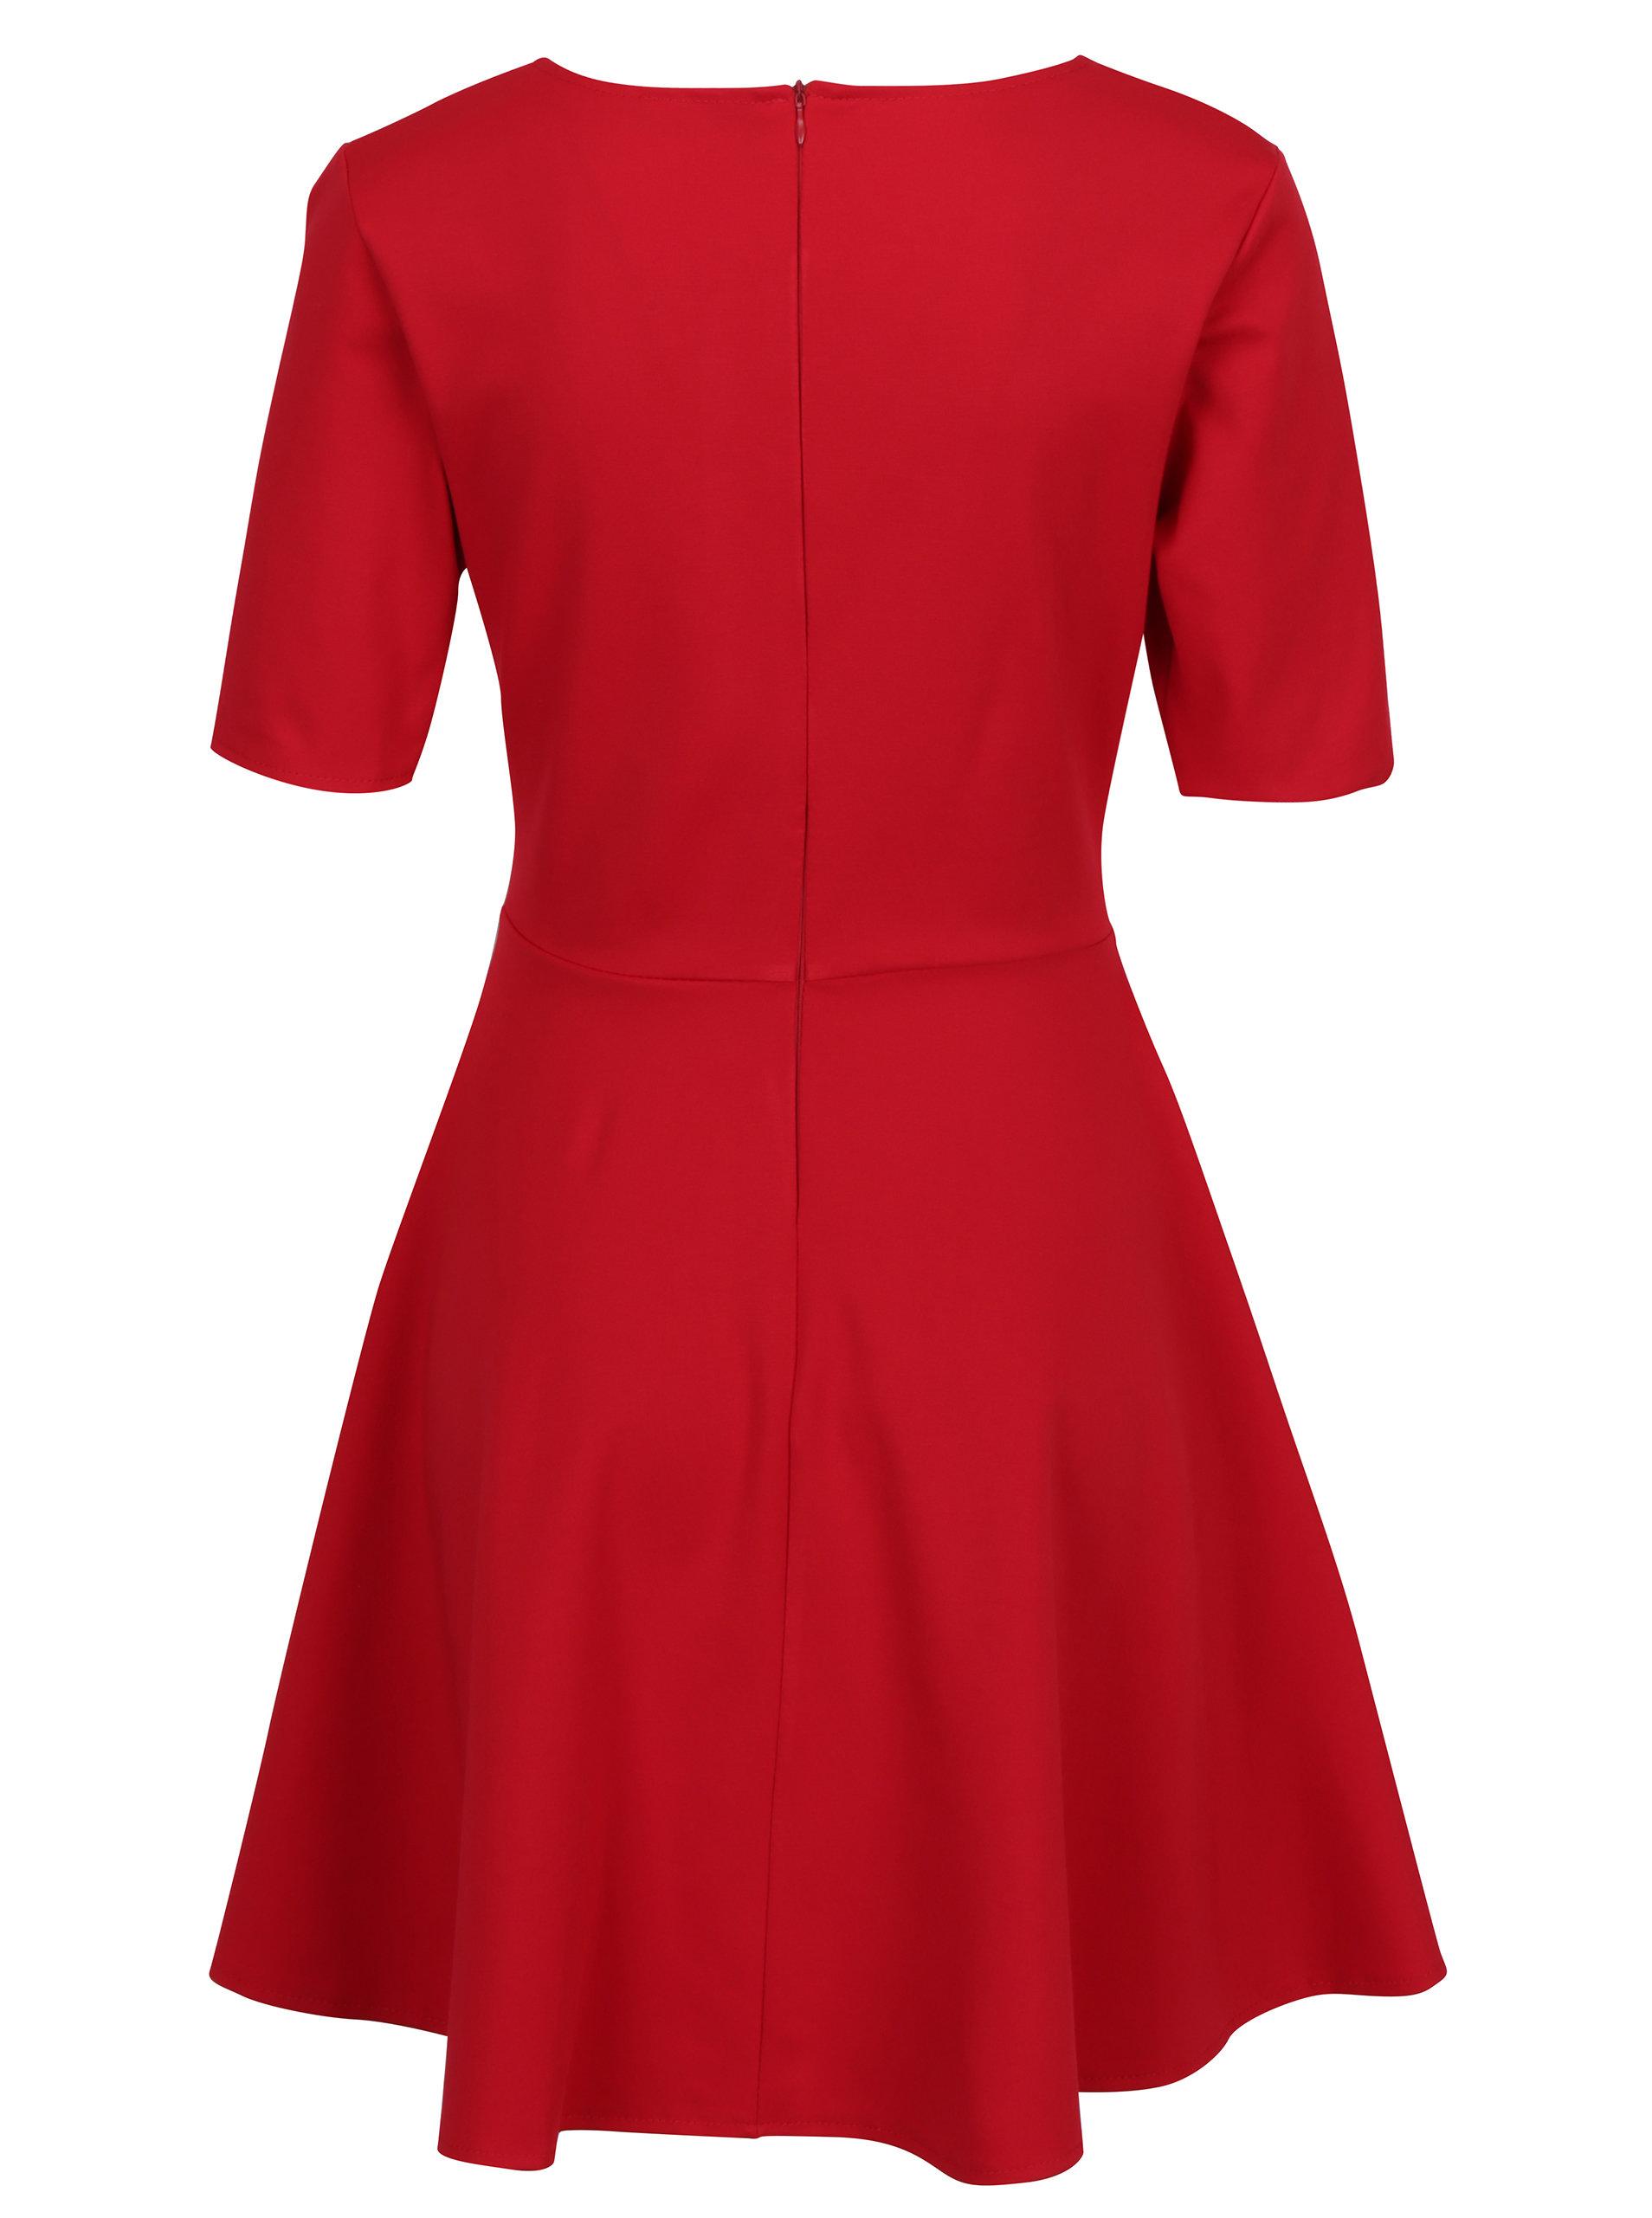 a133b67061a1 Červené šaty s áčkovou sukňou ZOOT ...